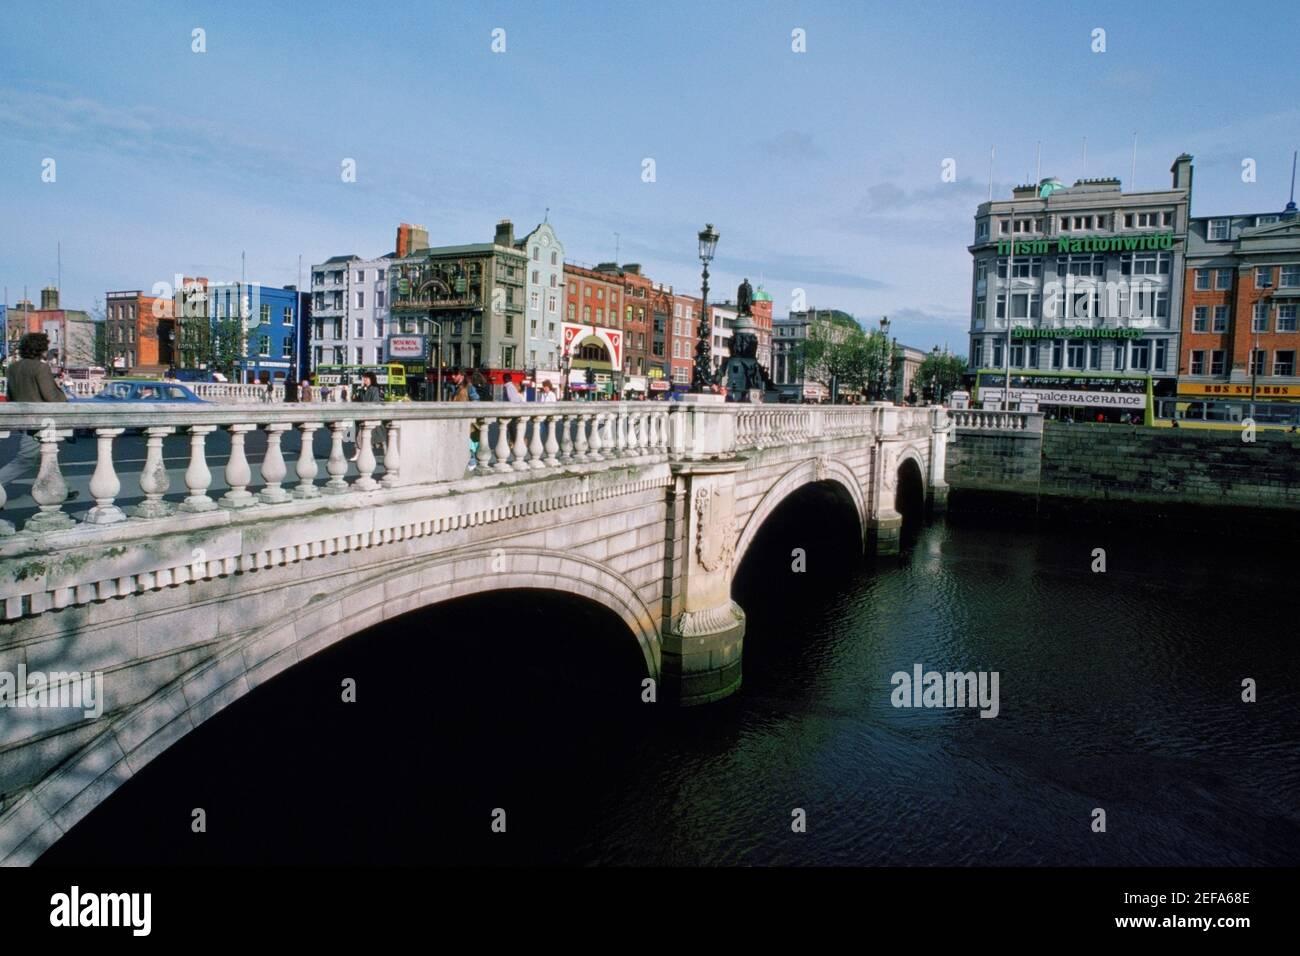 Bride over a river, OŽConnell Street Bridge, River Liffey, Dublin, Republic of Ireland Stock Photo